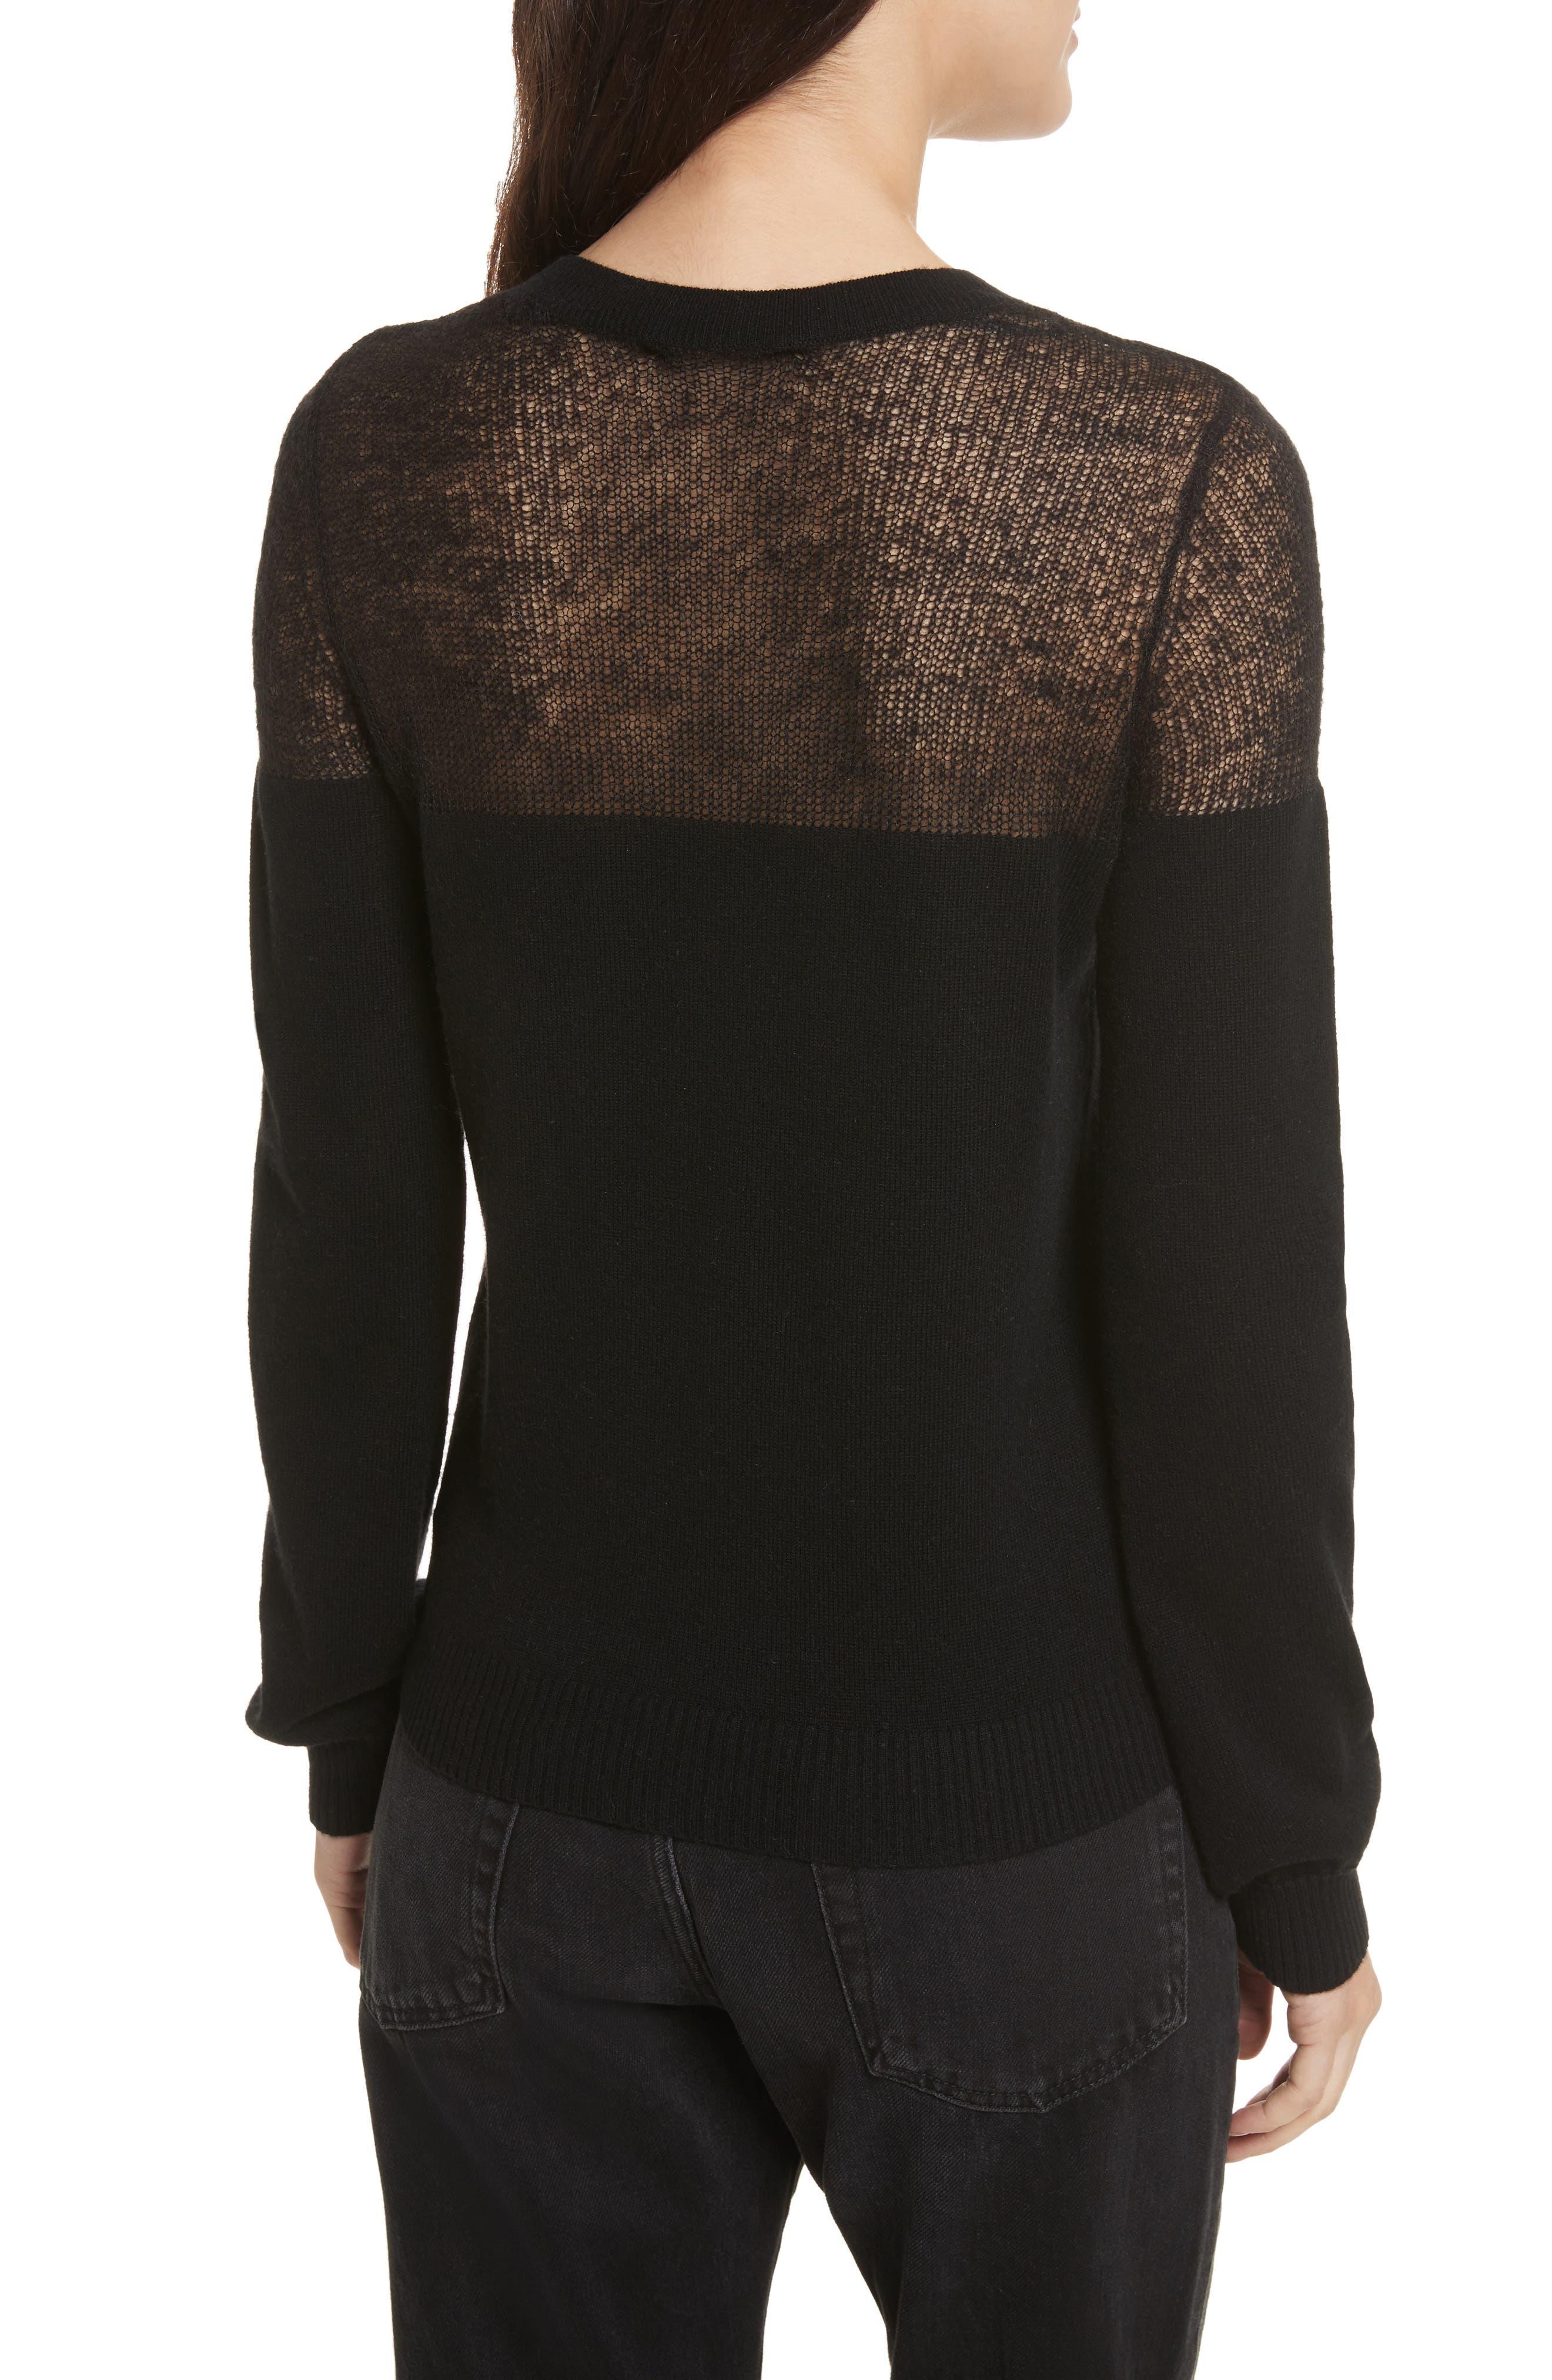 Clarence Sweater,                             Alternate thumbnail 2, color,                             Black Multi